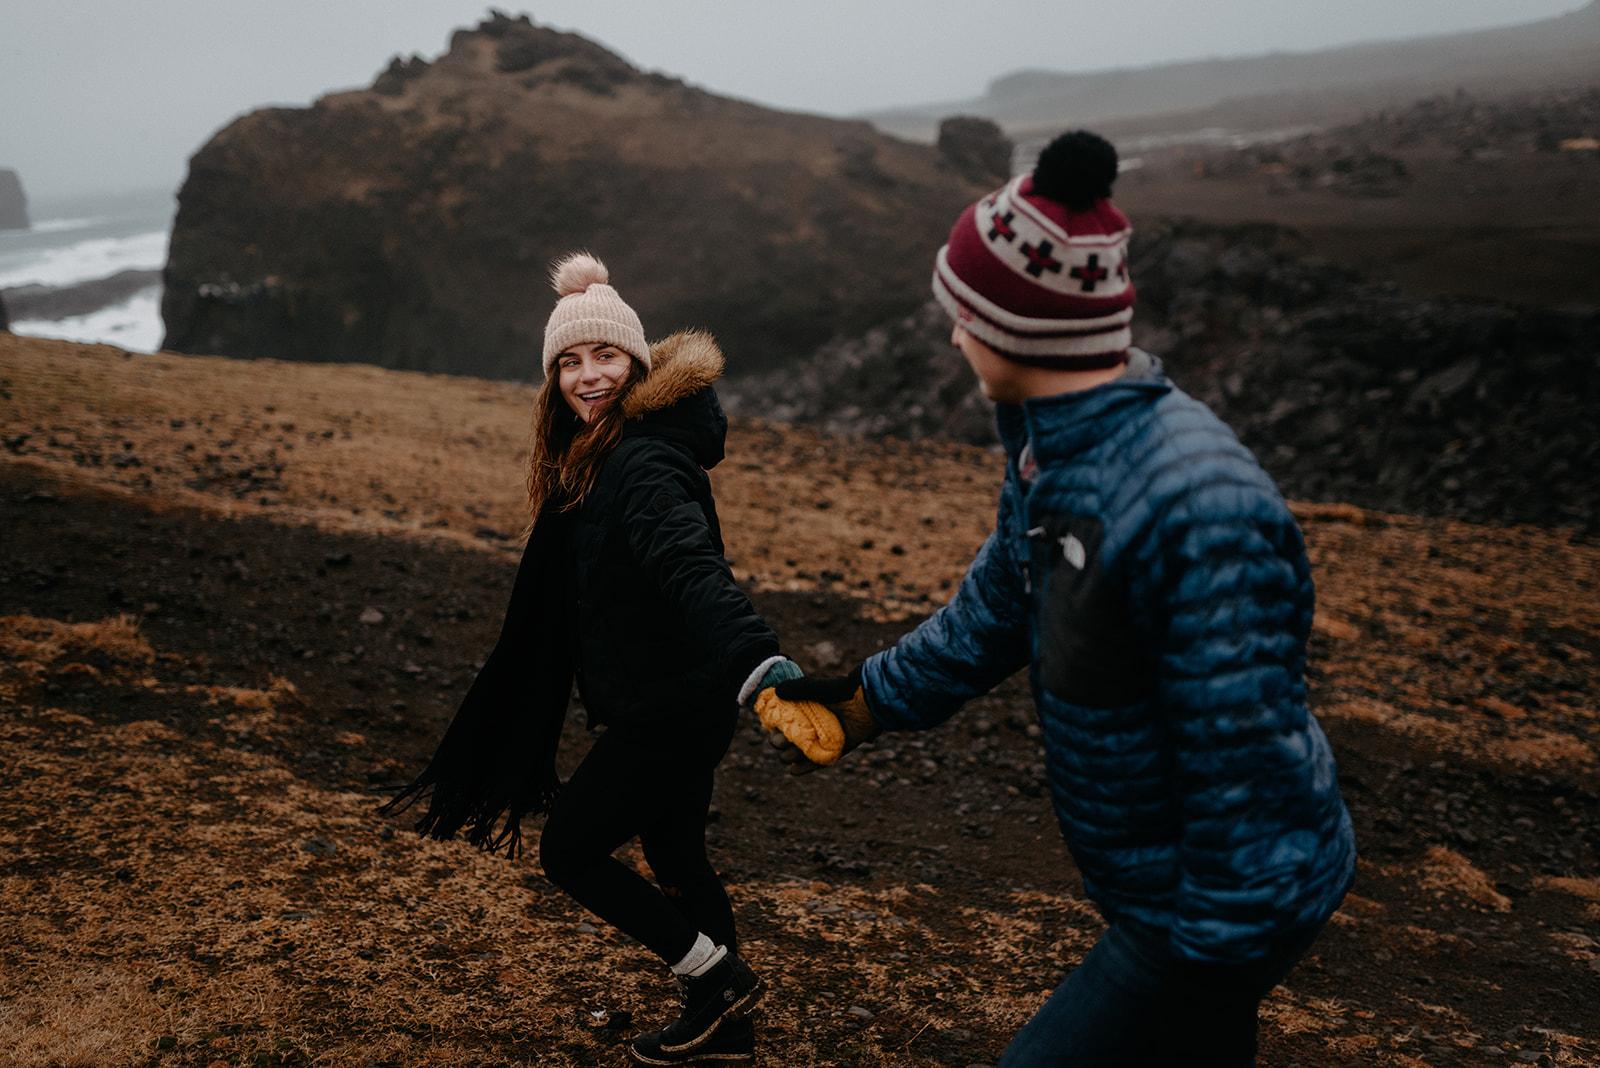 Mack & Michael - Sesja na Islandii 20 alebosco islandia mm 20